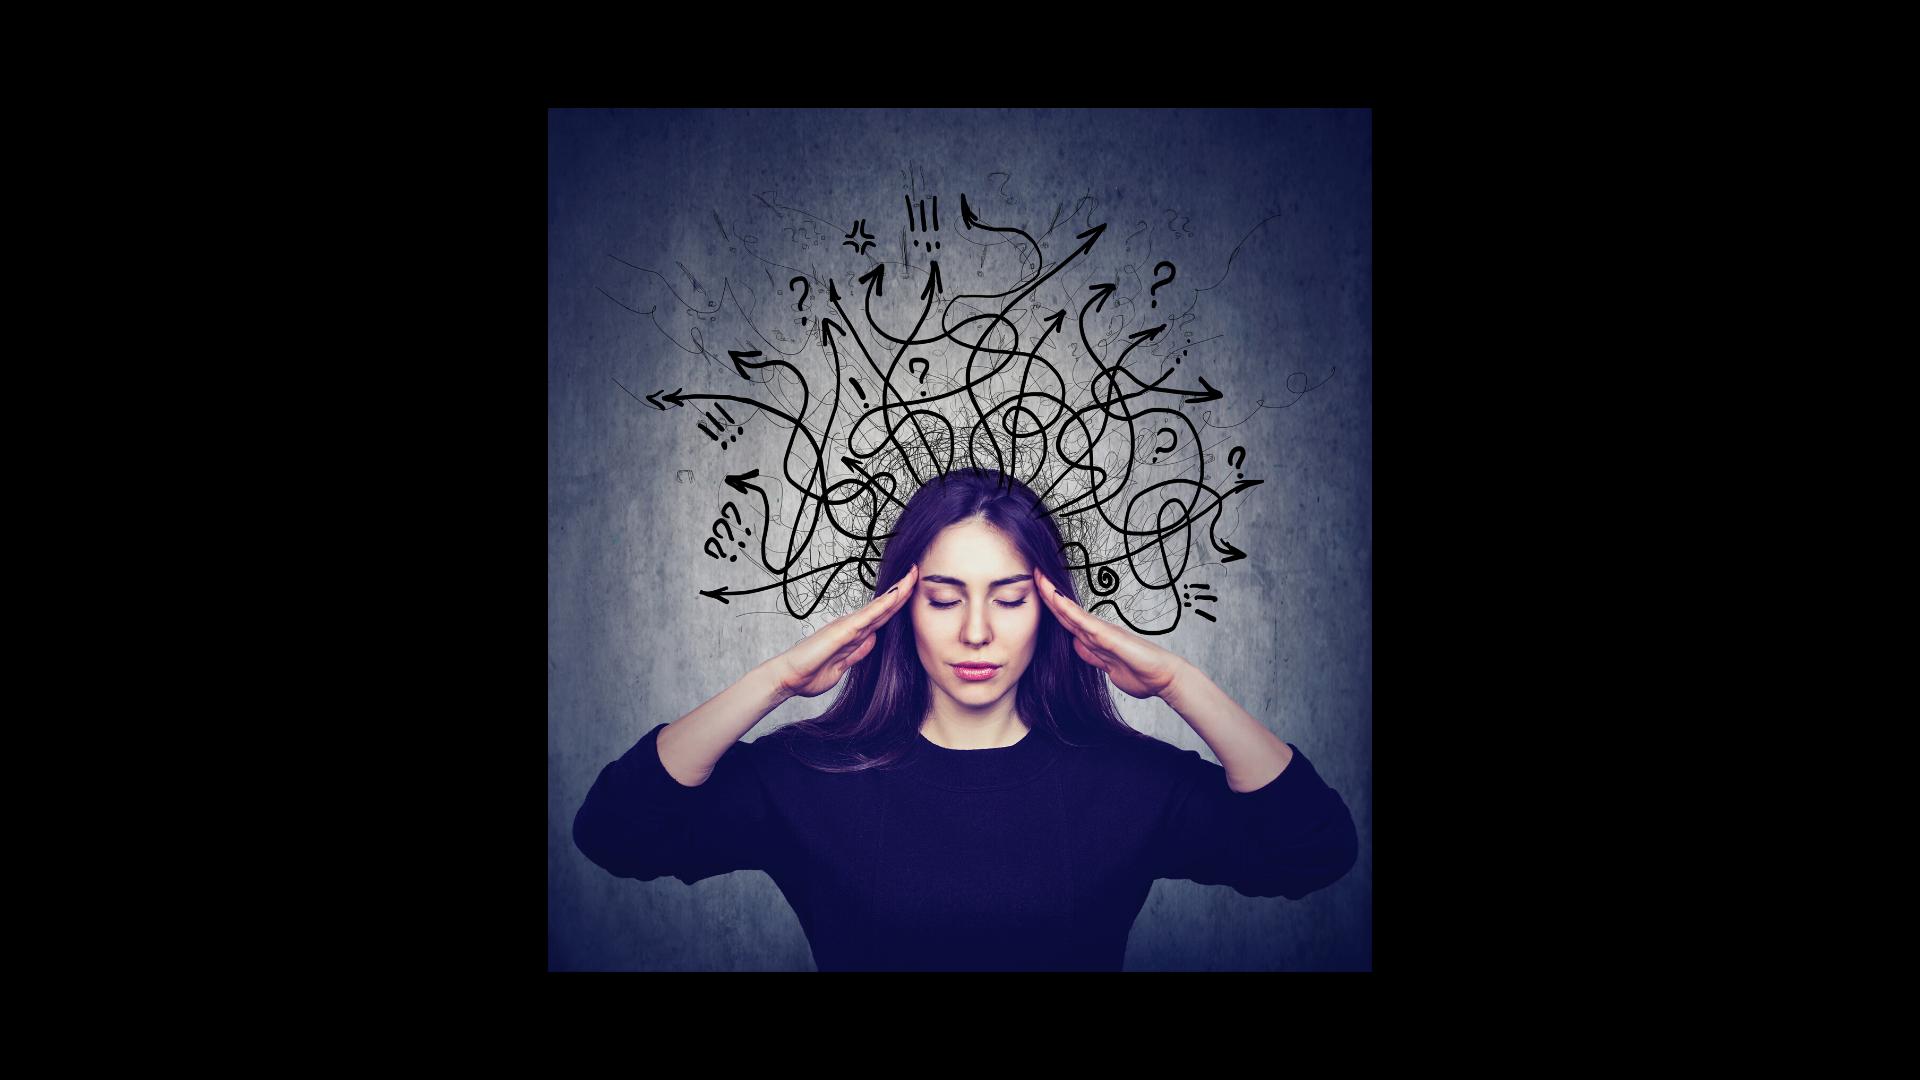 La mindfulness allevia i sintomi legati all'emicrania?